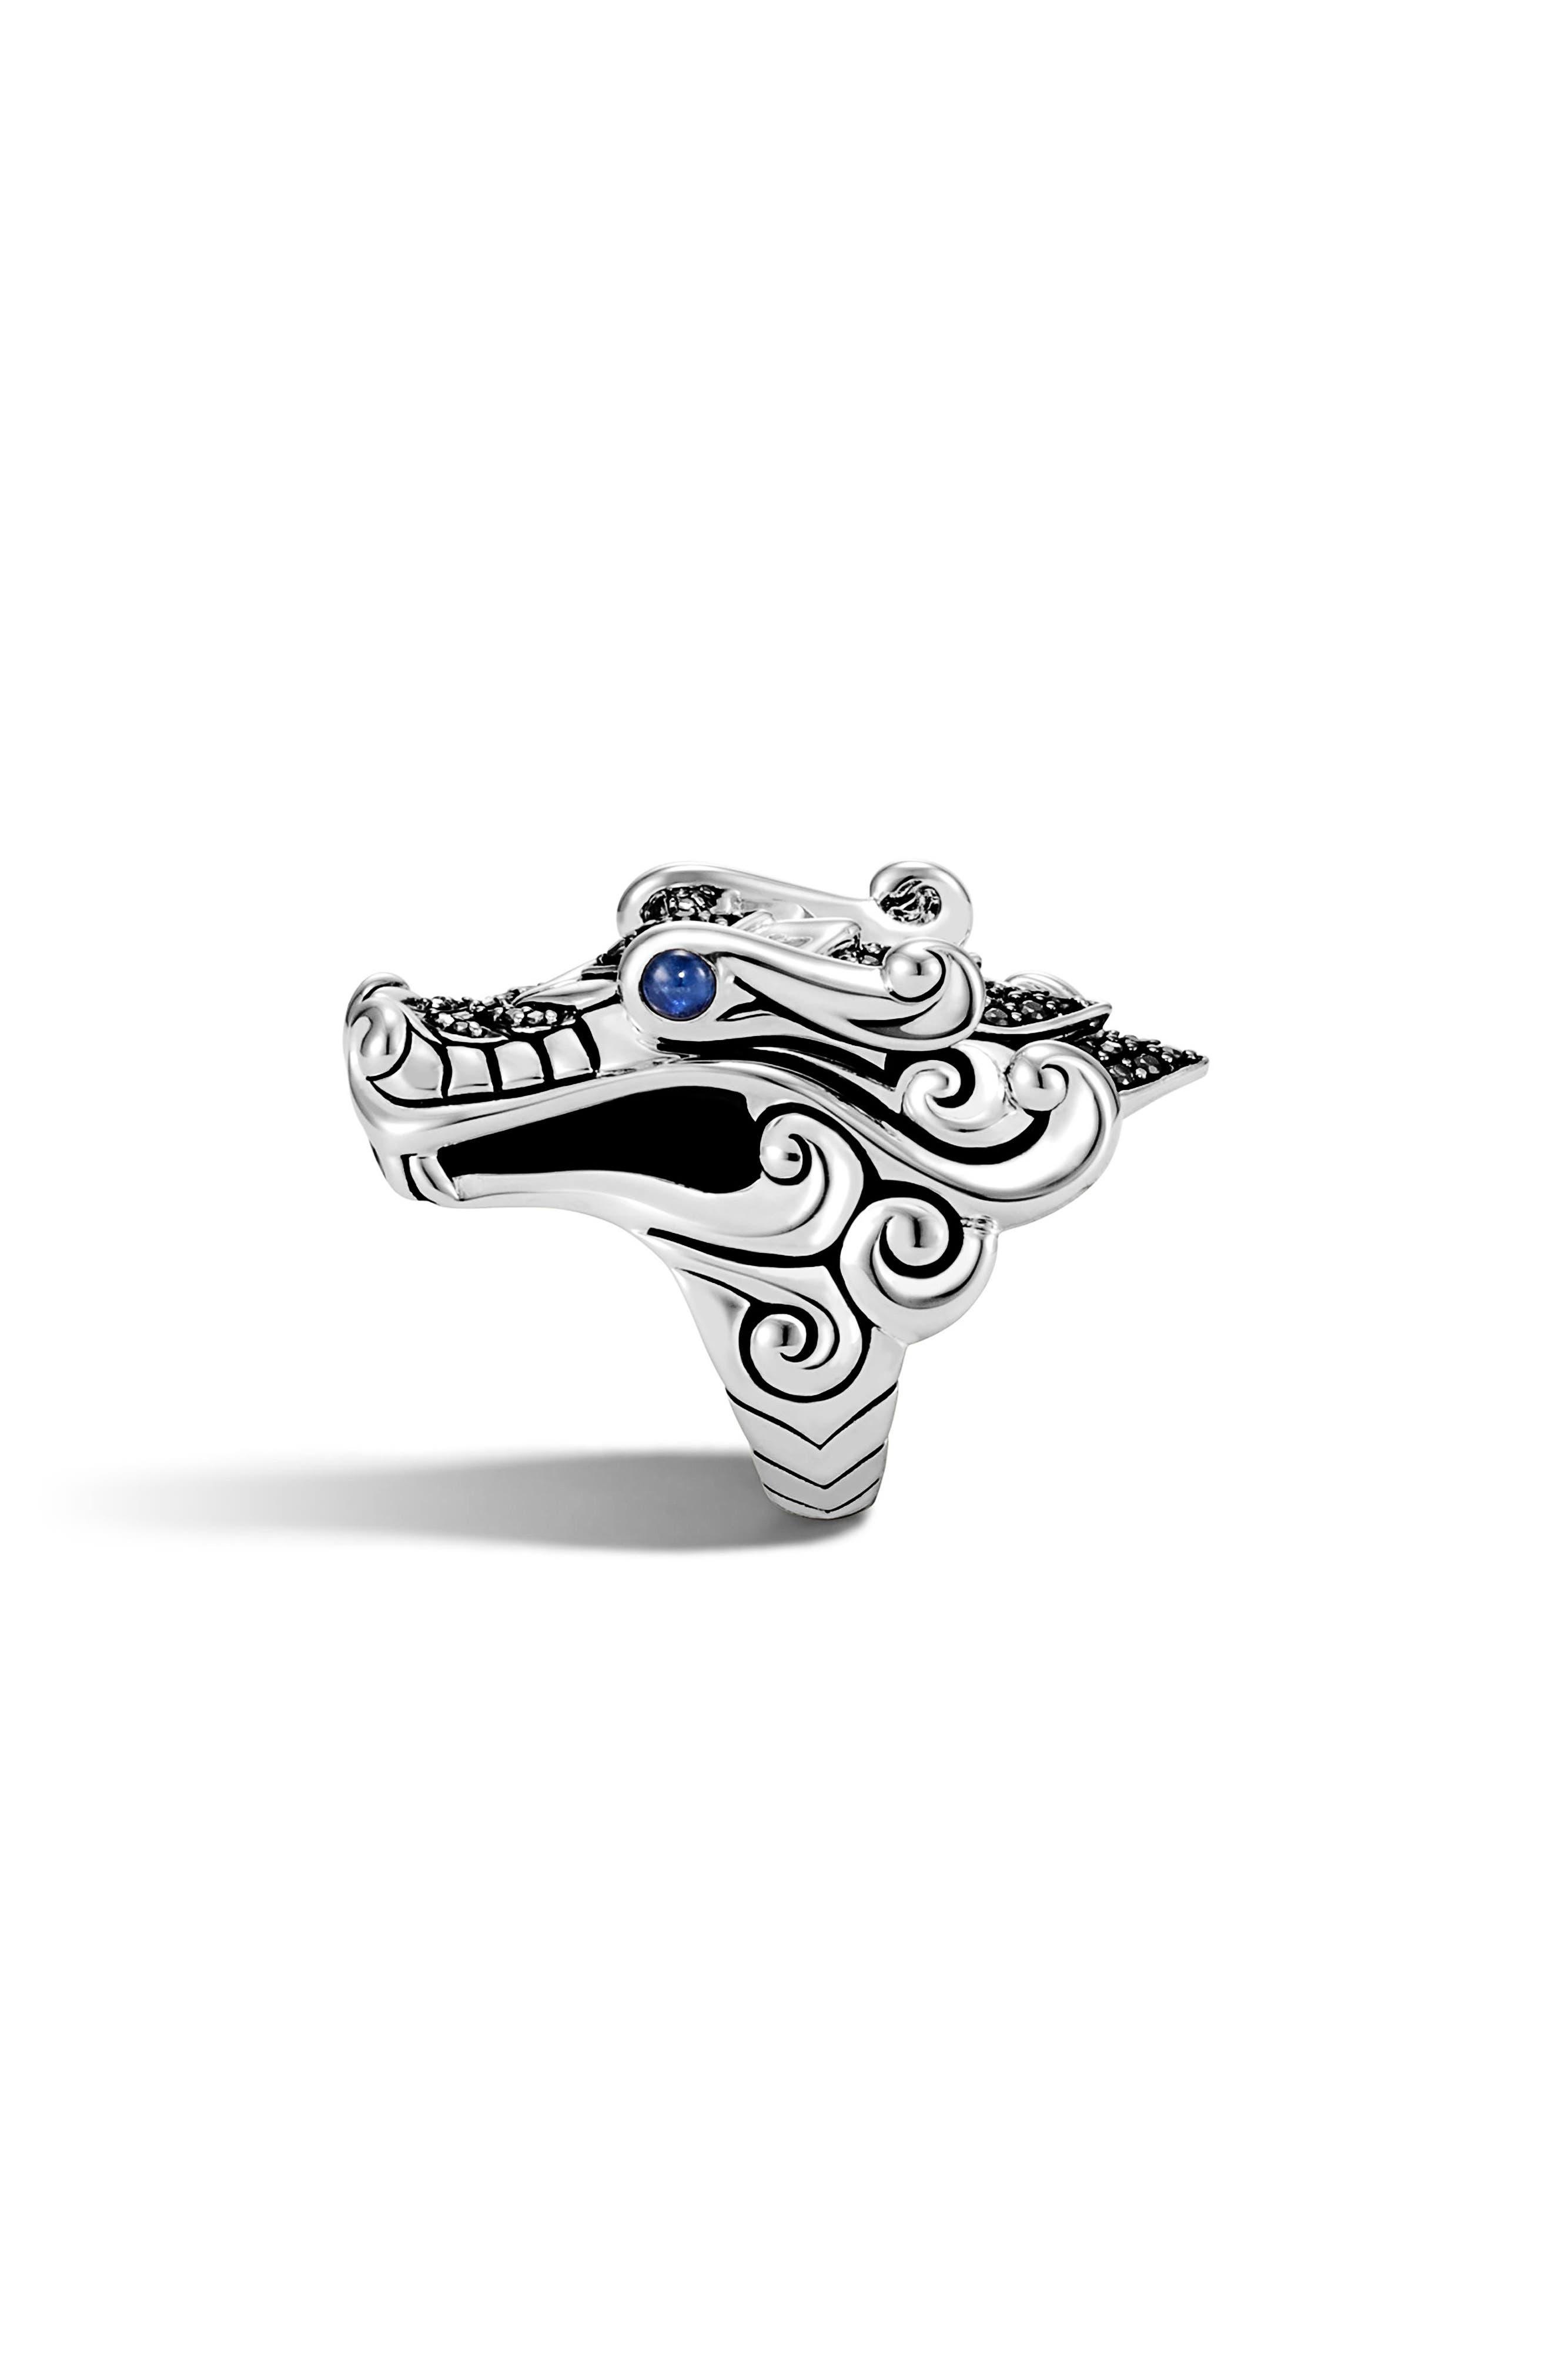 Legends Naga Ring,                             Alternate thumbnail 2, color,                             SILVER/ BLACK/ BLUE SAPPHIRE